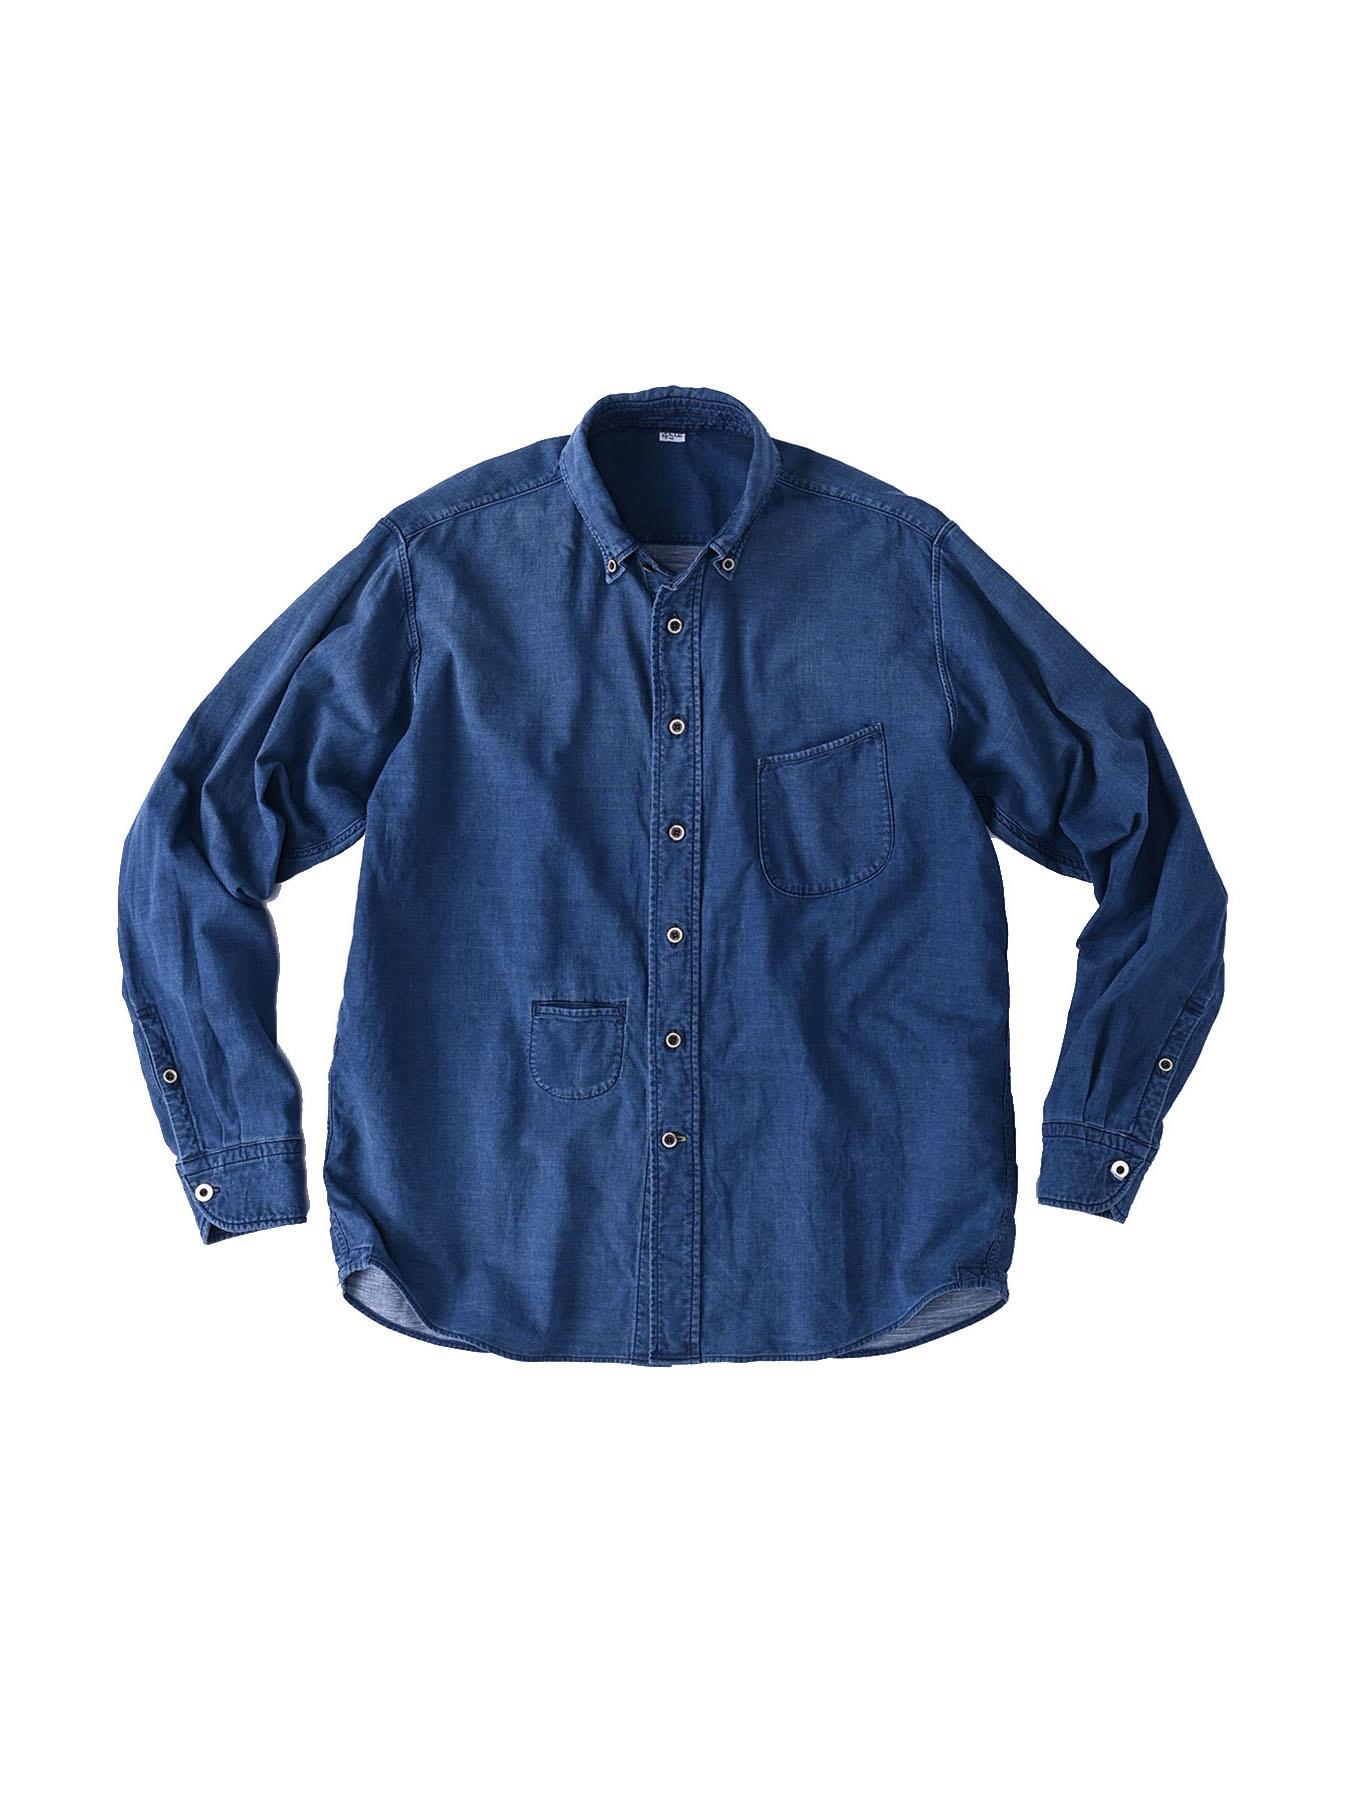 Indigo Gauze 908 Ocean Shirt Distressed-1